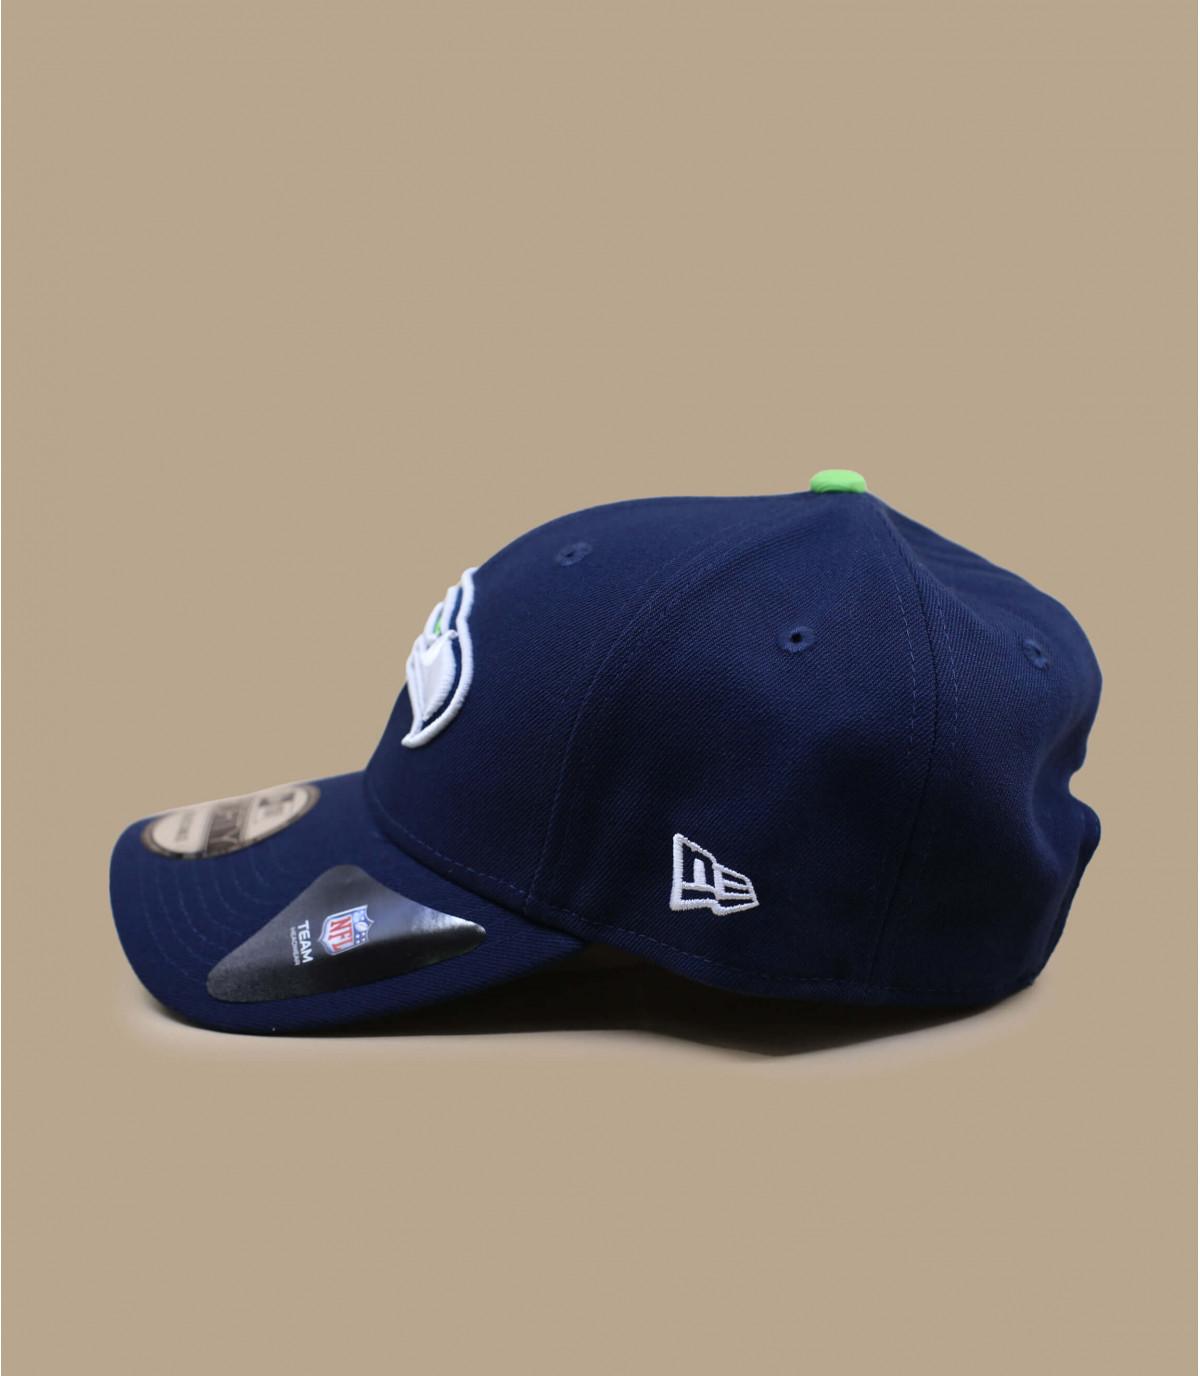 Seahawks blauwe dop